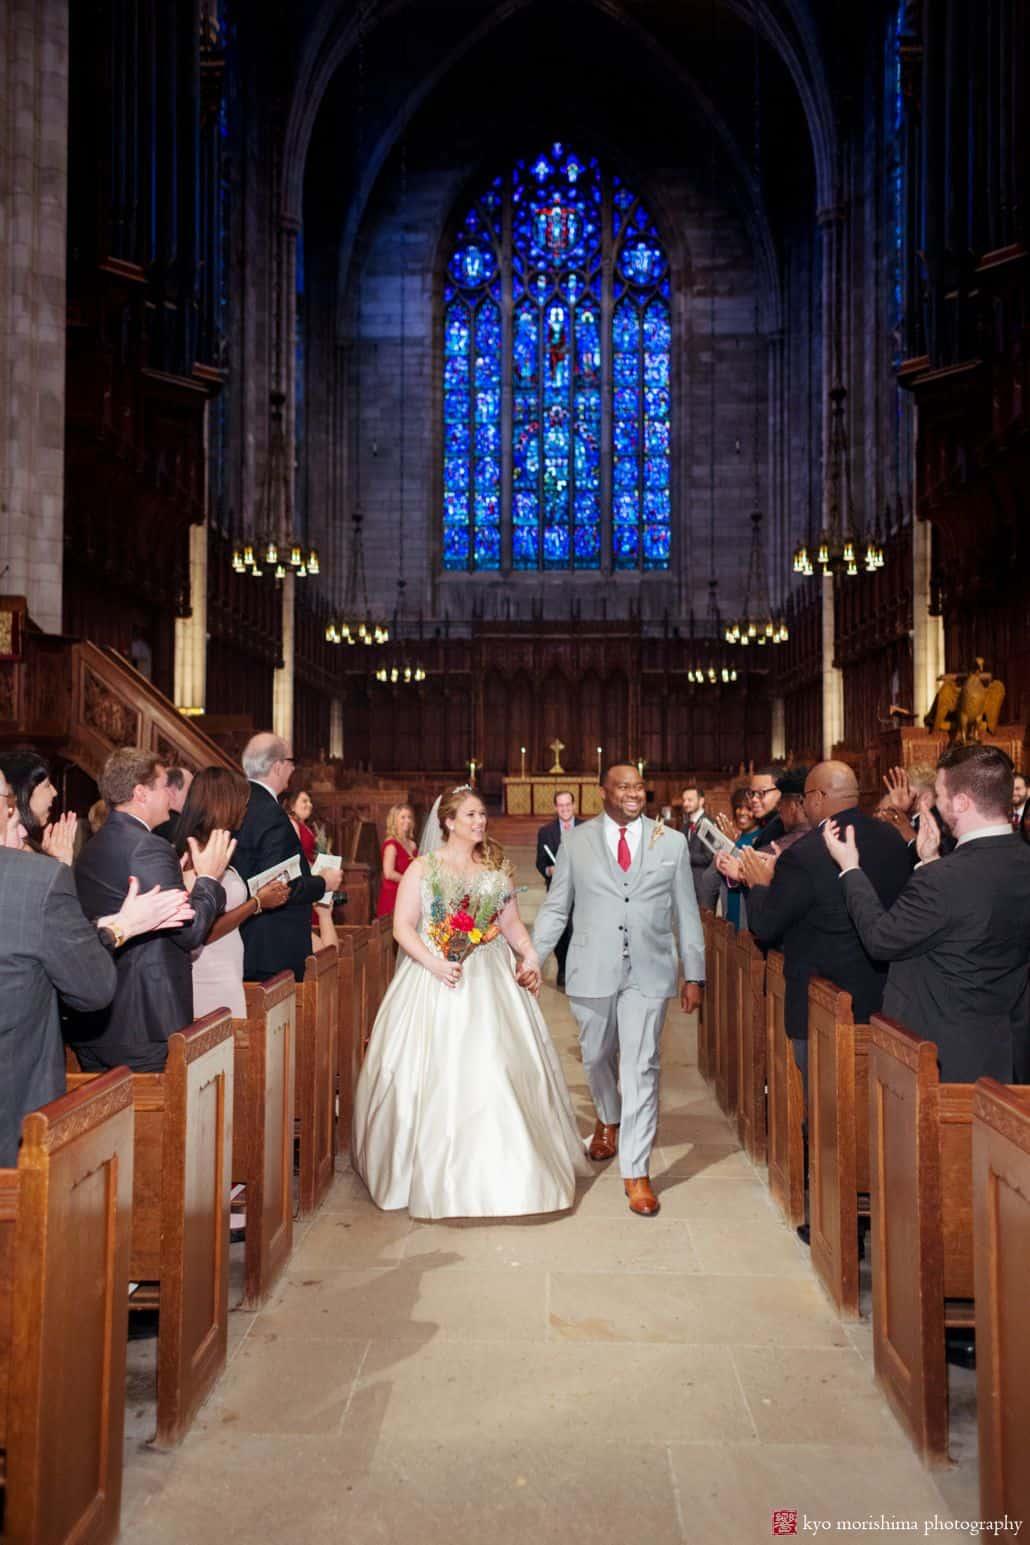 Bride and groom depart Princeton University chapel wedding, holding hands